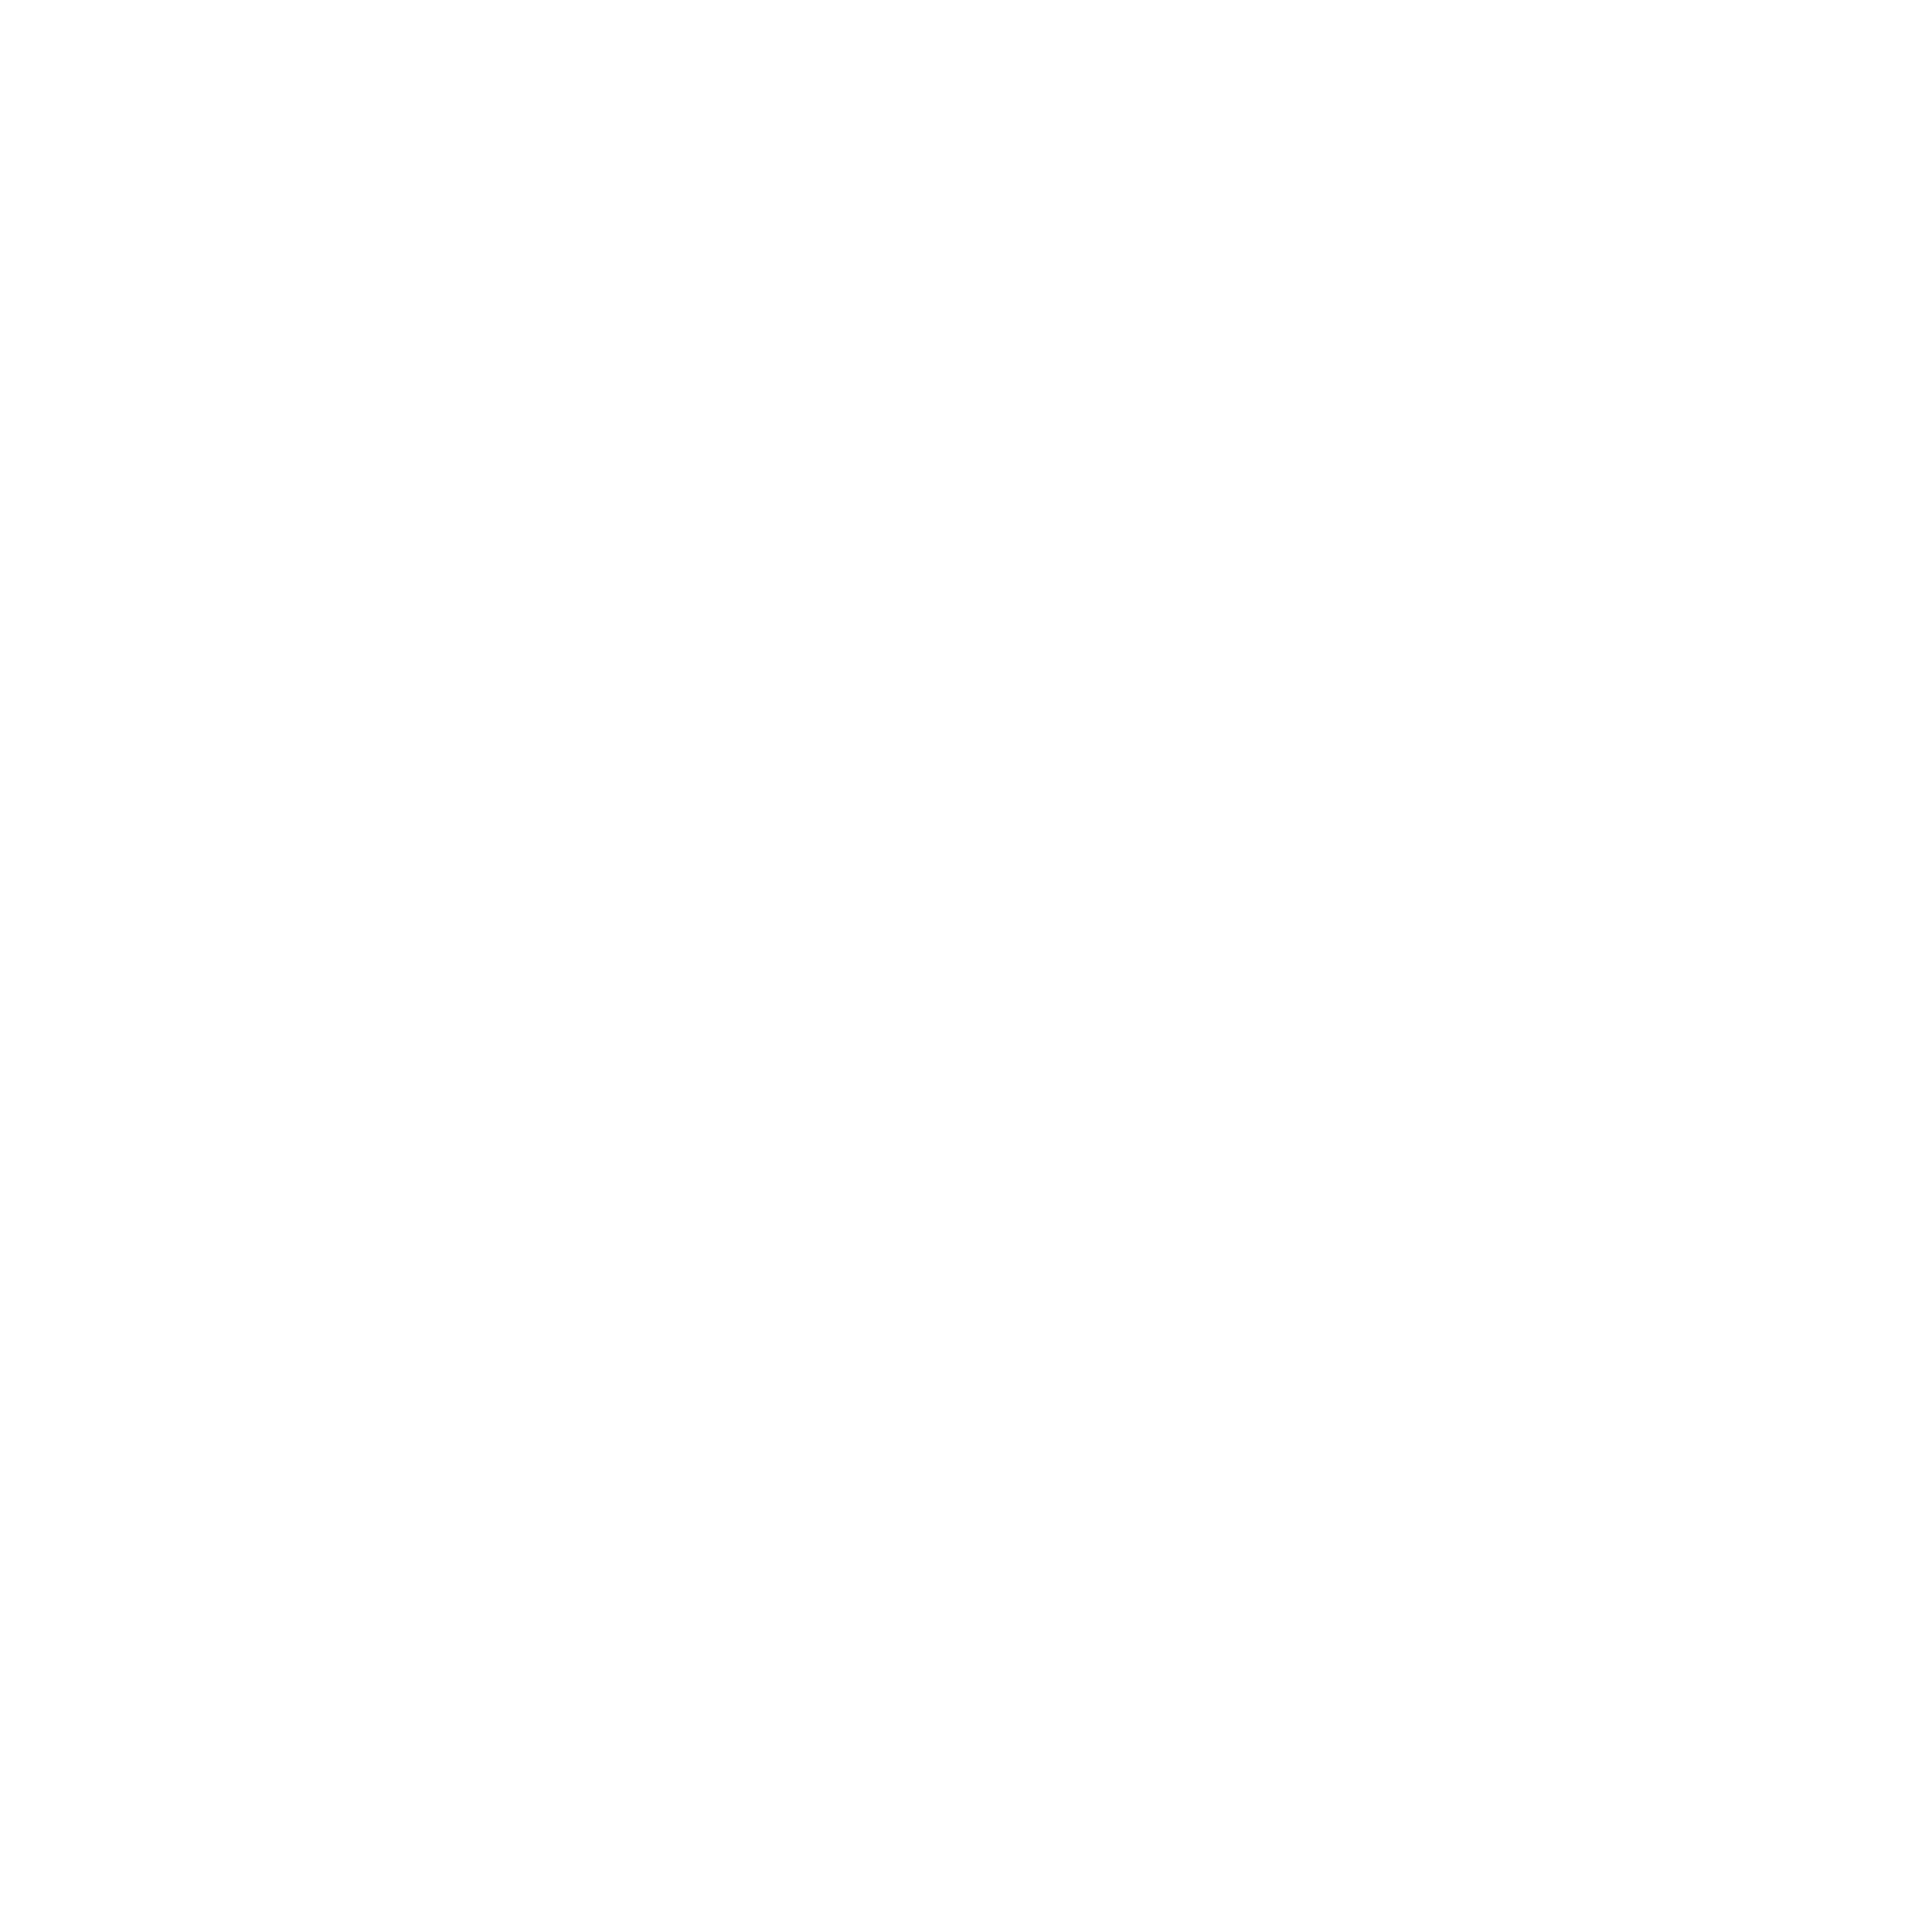 Lavinia Frantzen